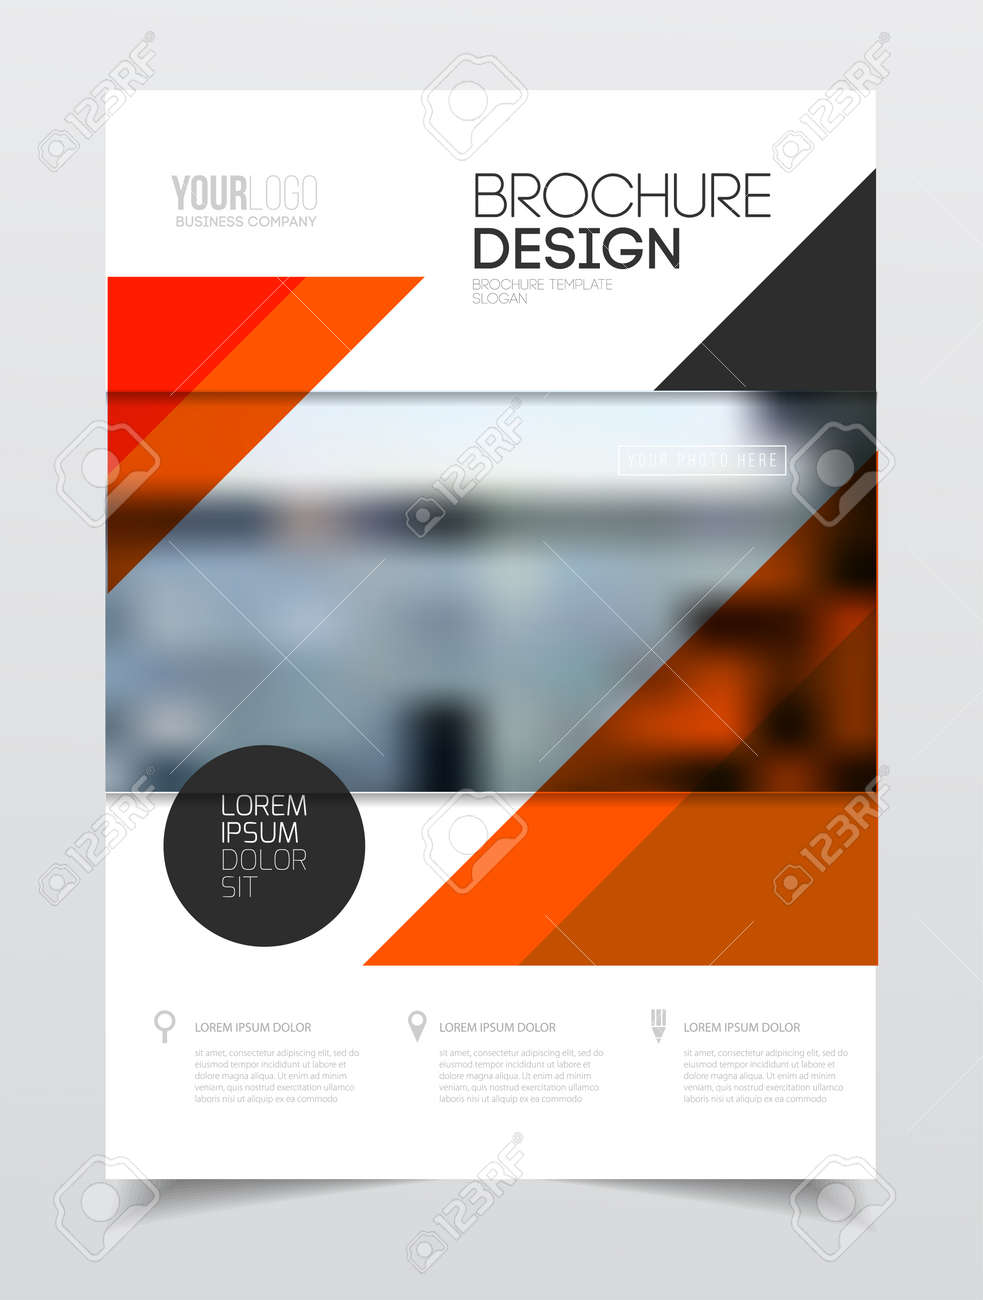 catalogue cover design annual report vector illustration template